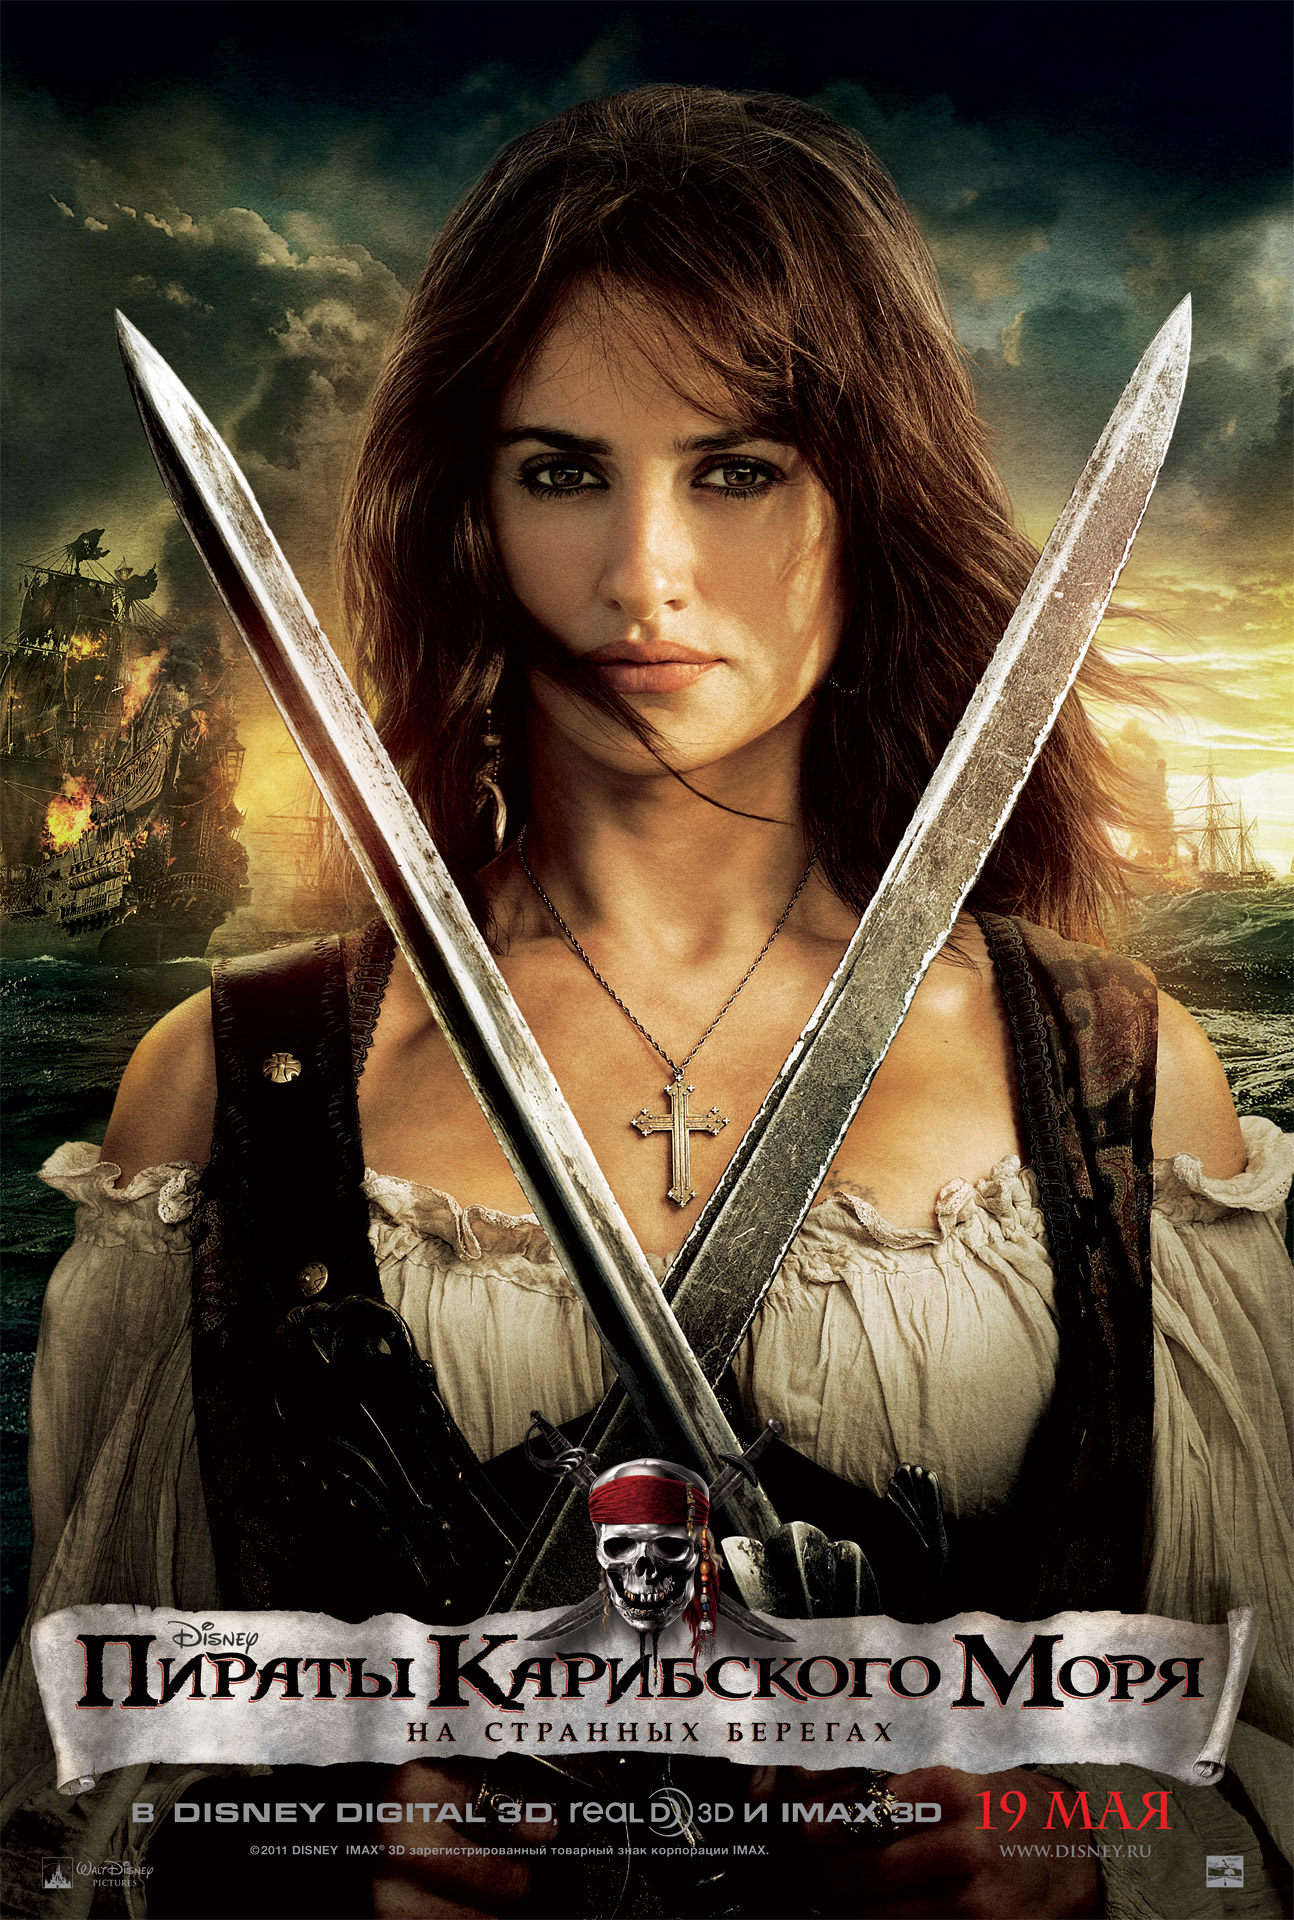 Пираты Карибского моря: На странных берегах (Pirates of the Caribbean: On Stranger Tides, 2011) картинки